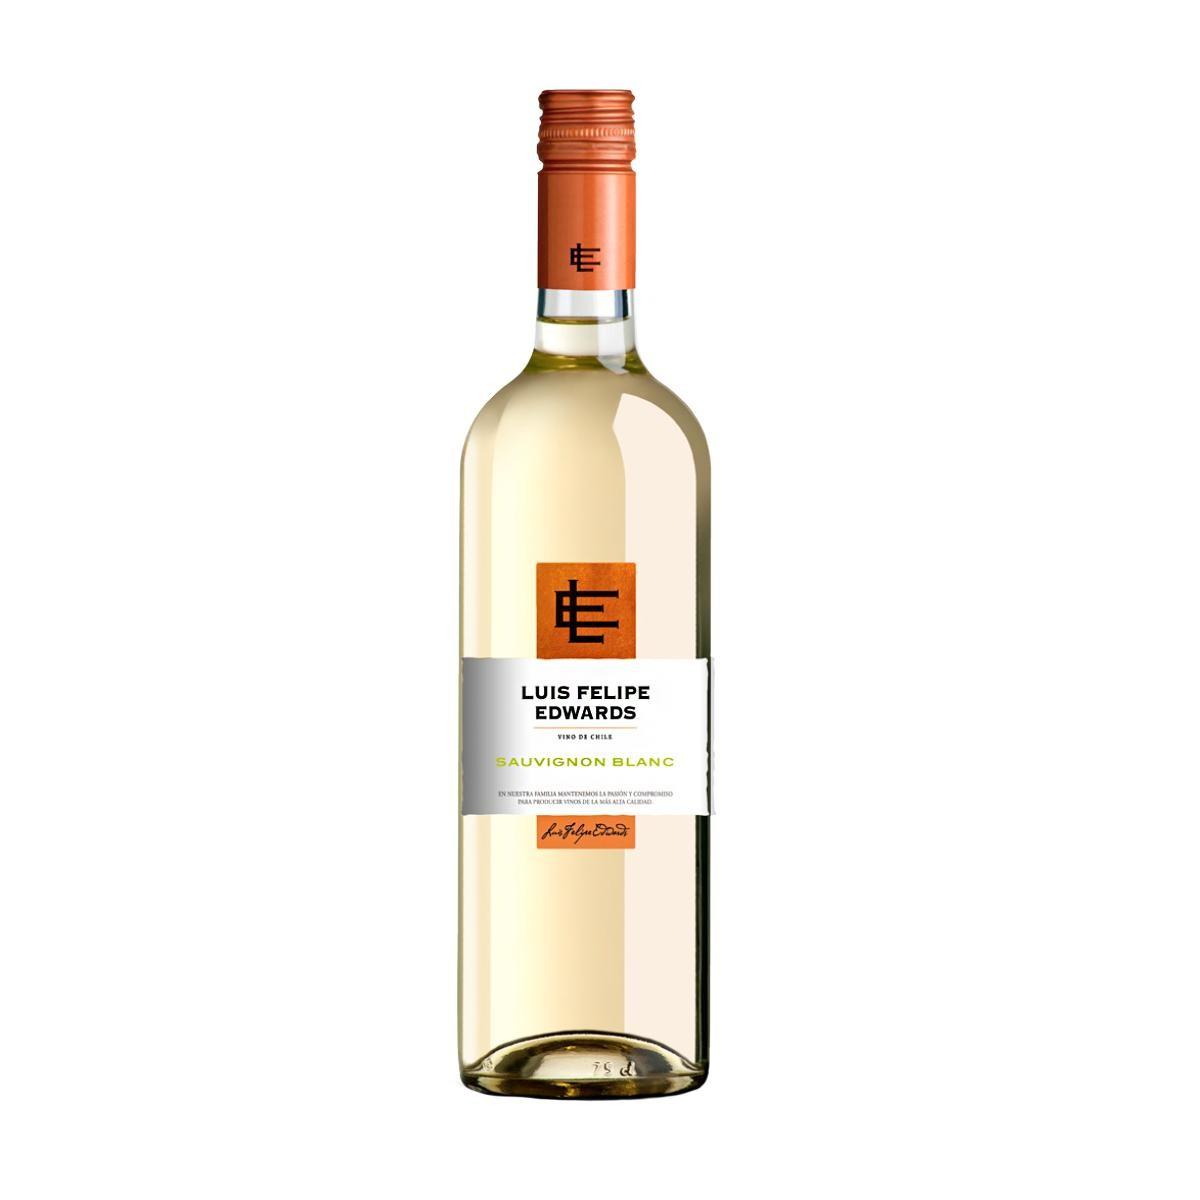 Luis Felipe Edwards Reserva Sauvignon Blanc